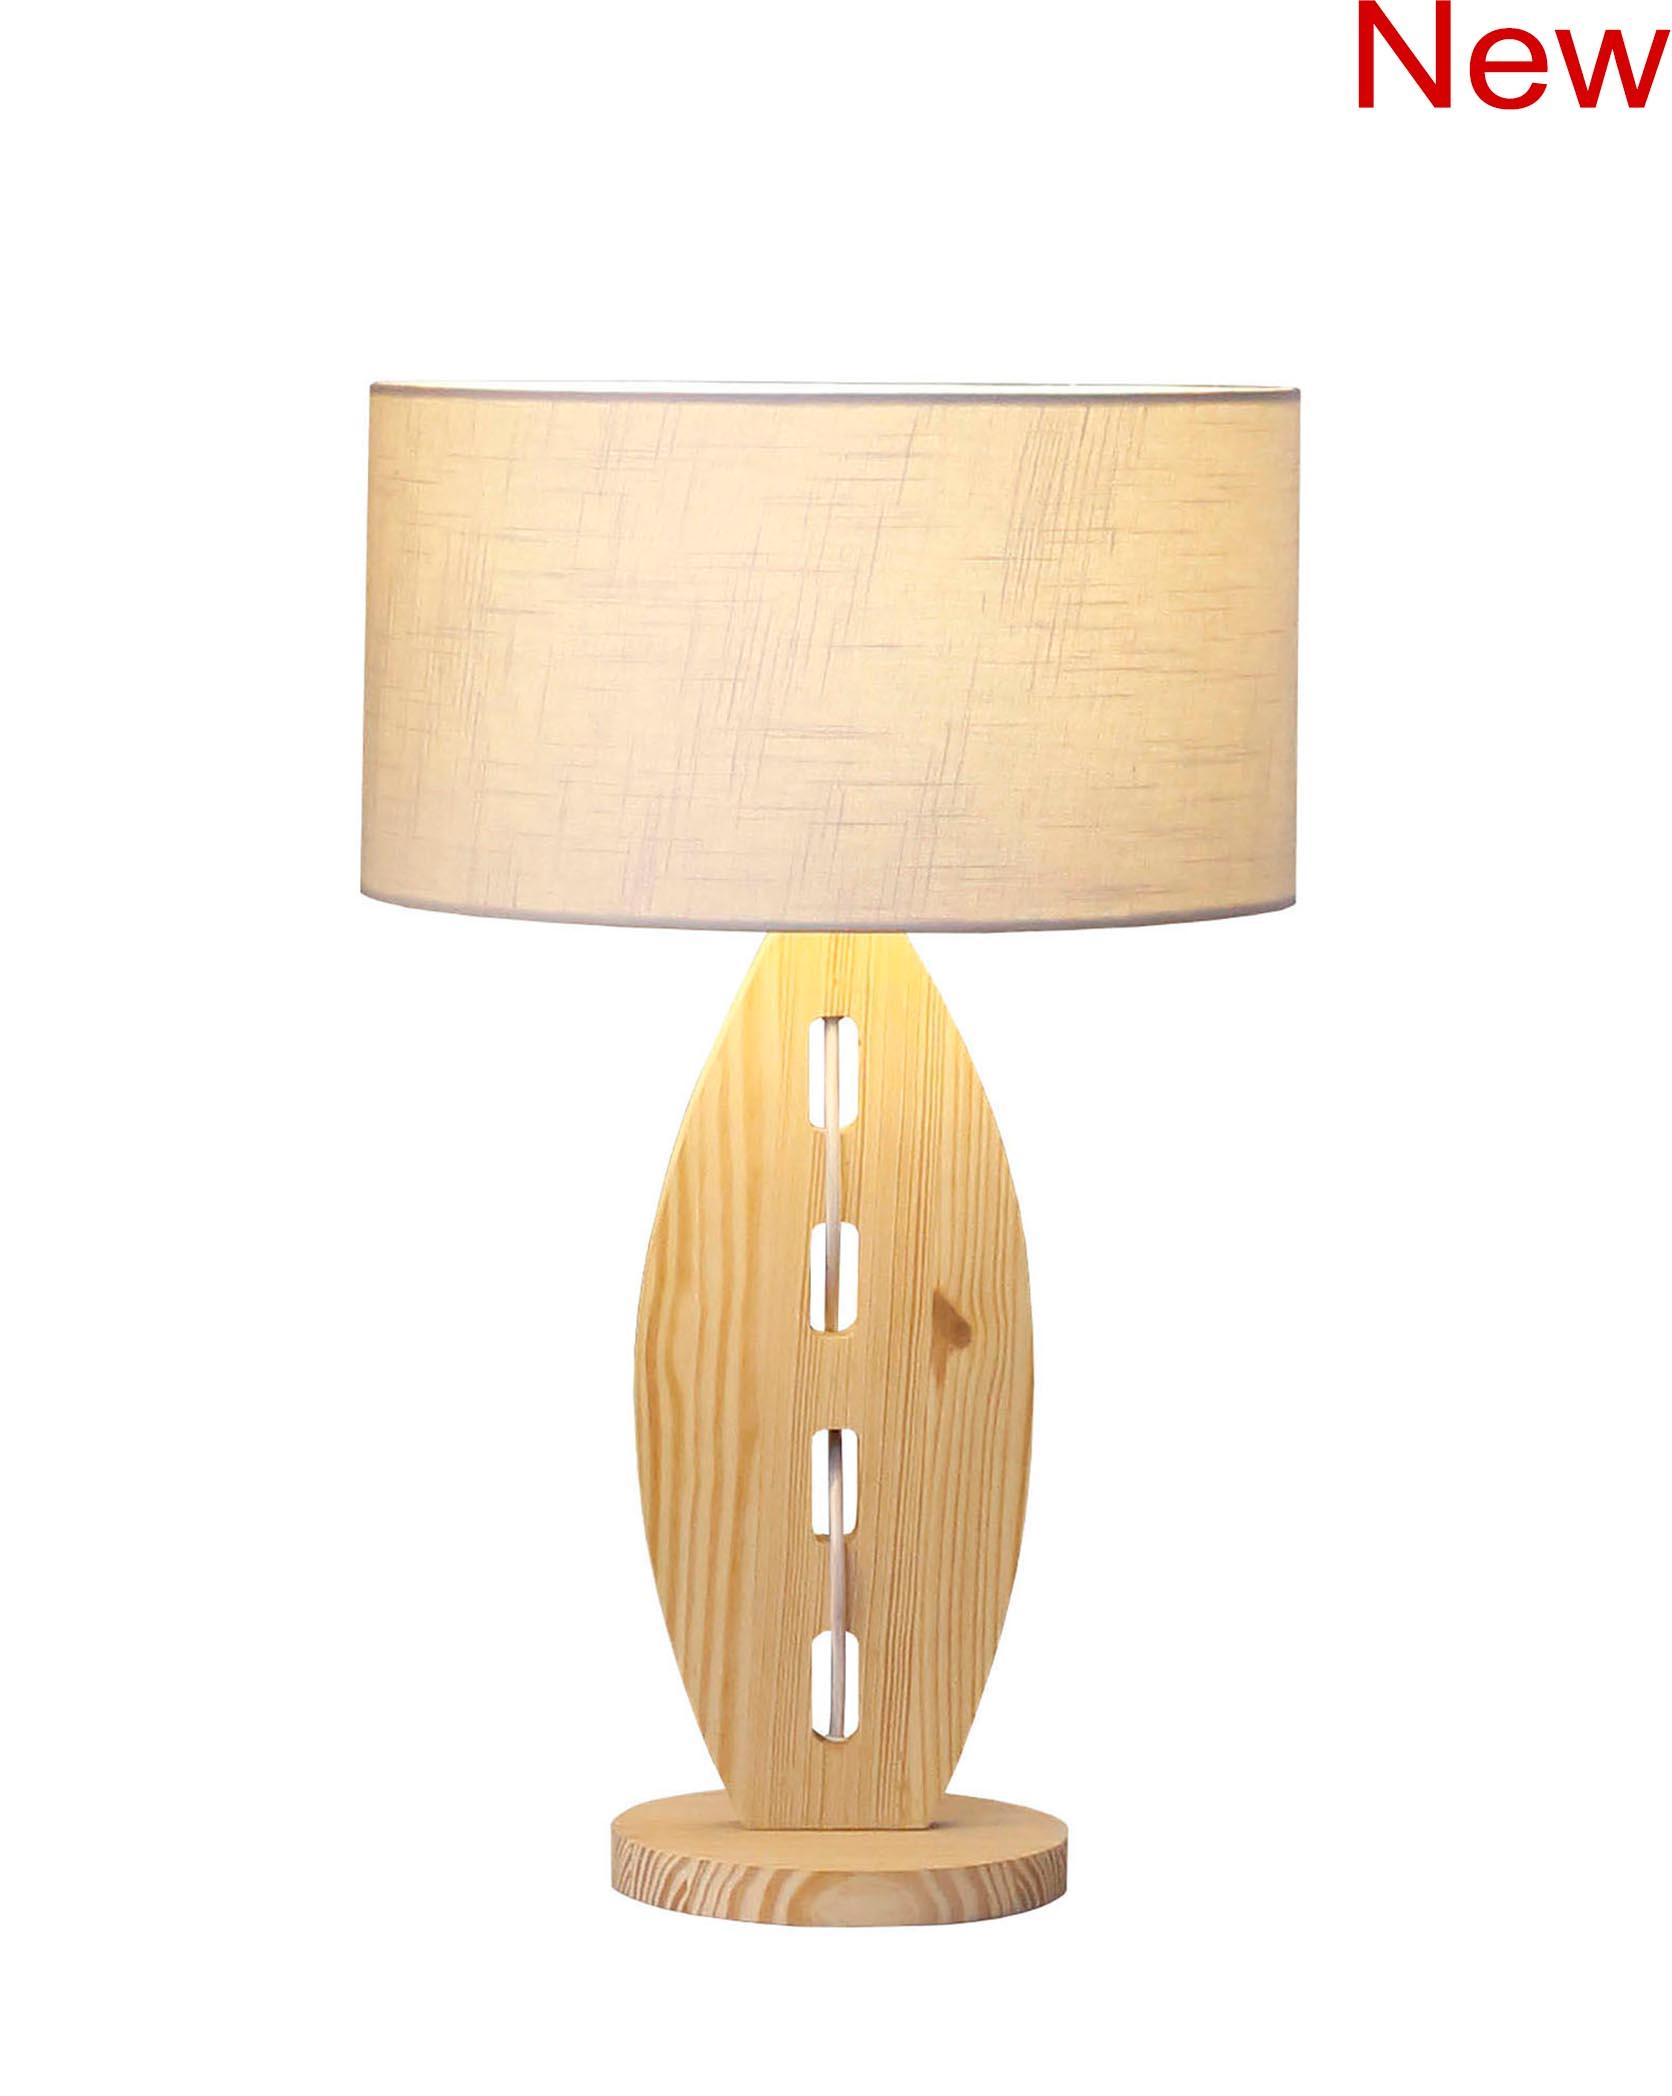 Malibu table lamp product photo #2